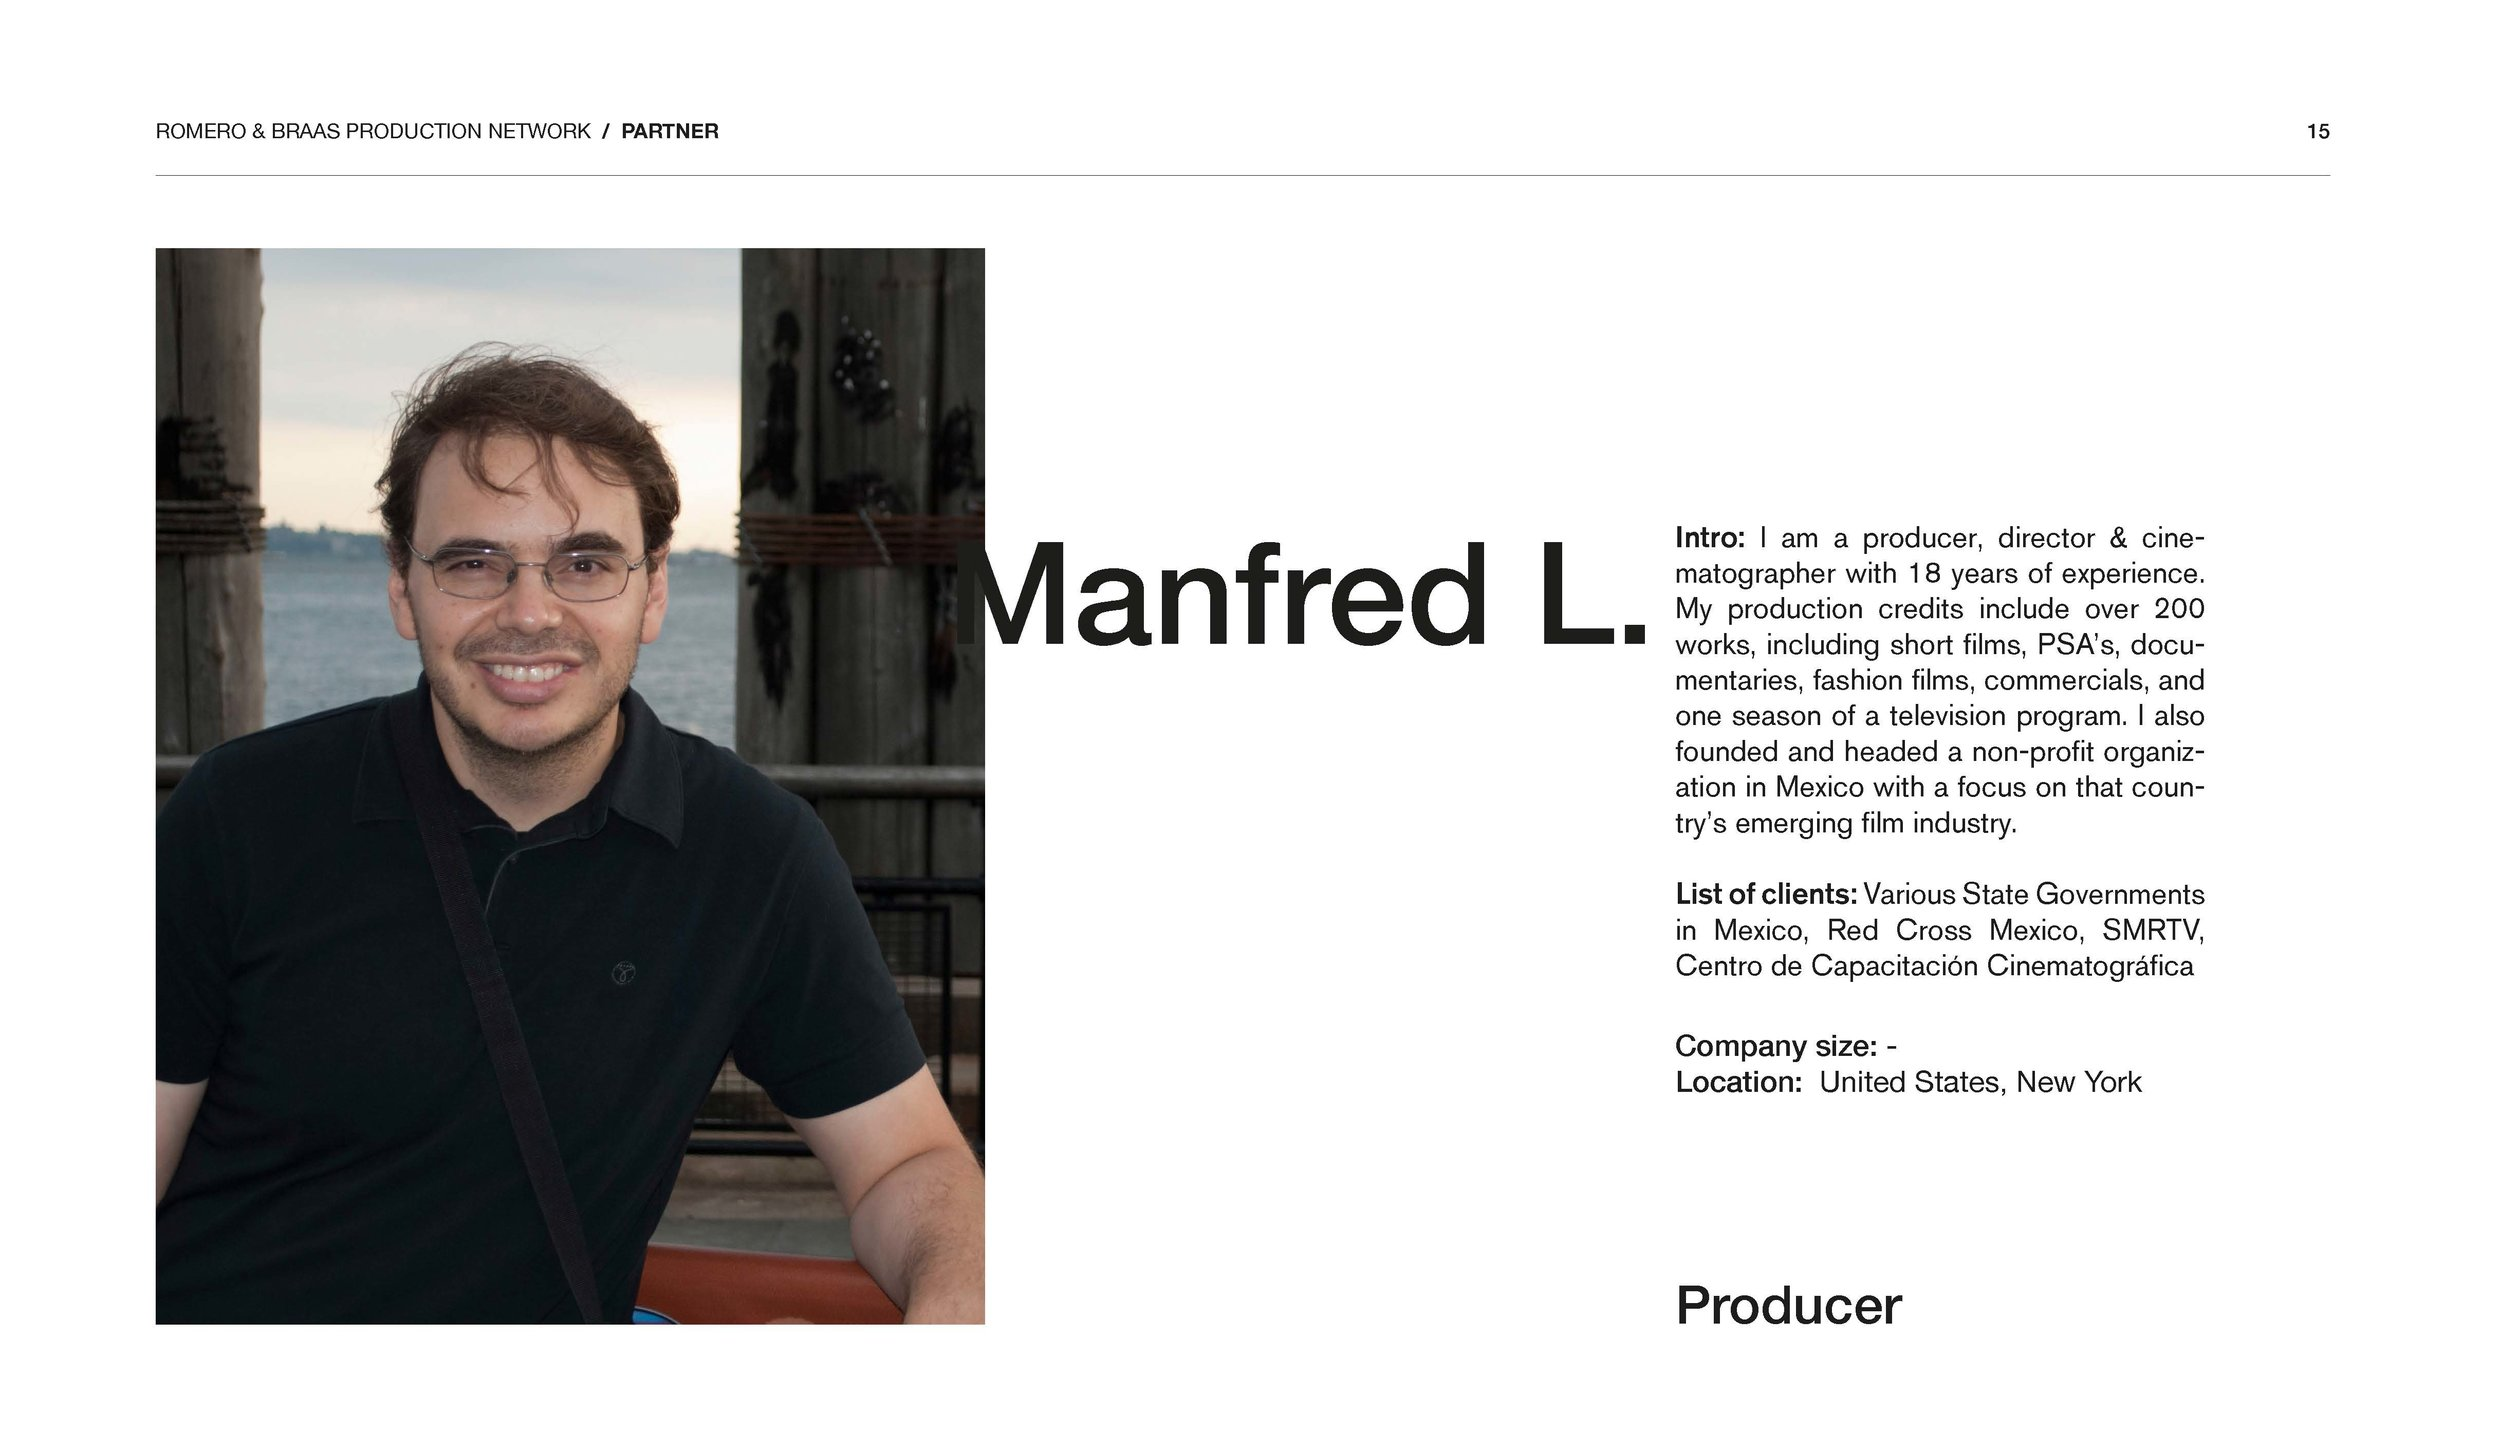 Production_Network_romeroandbraas_Seite_15.jpg